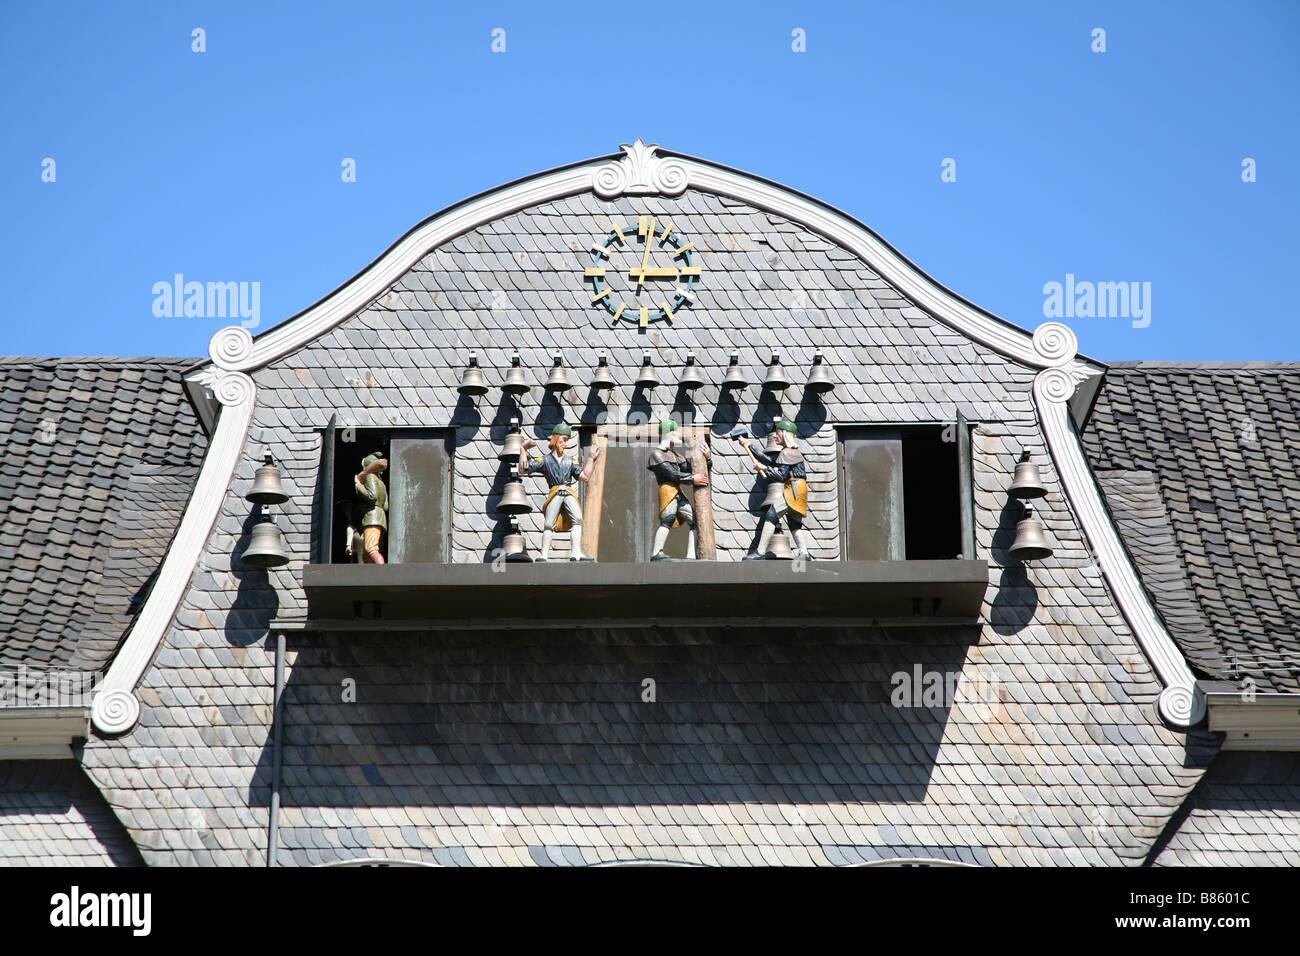 Goslar Marktplatz Marketplace Kaemmerei Kaiserringhaus Glockenspiel - Stock Image